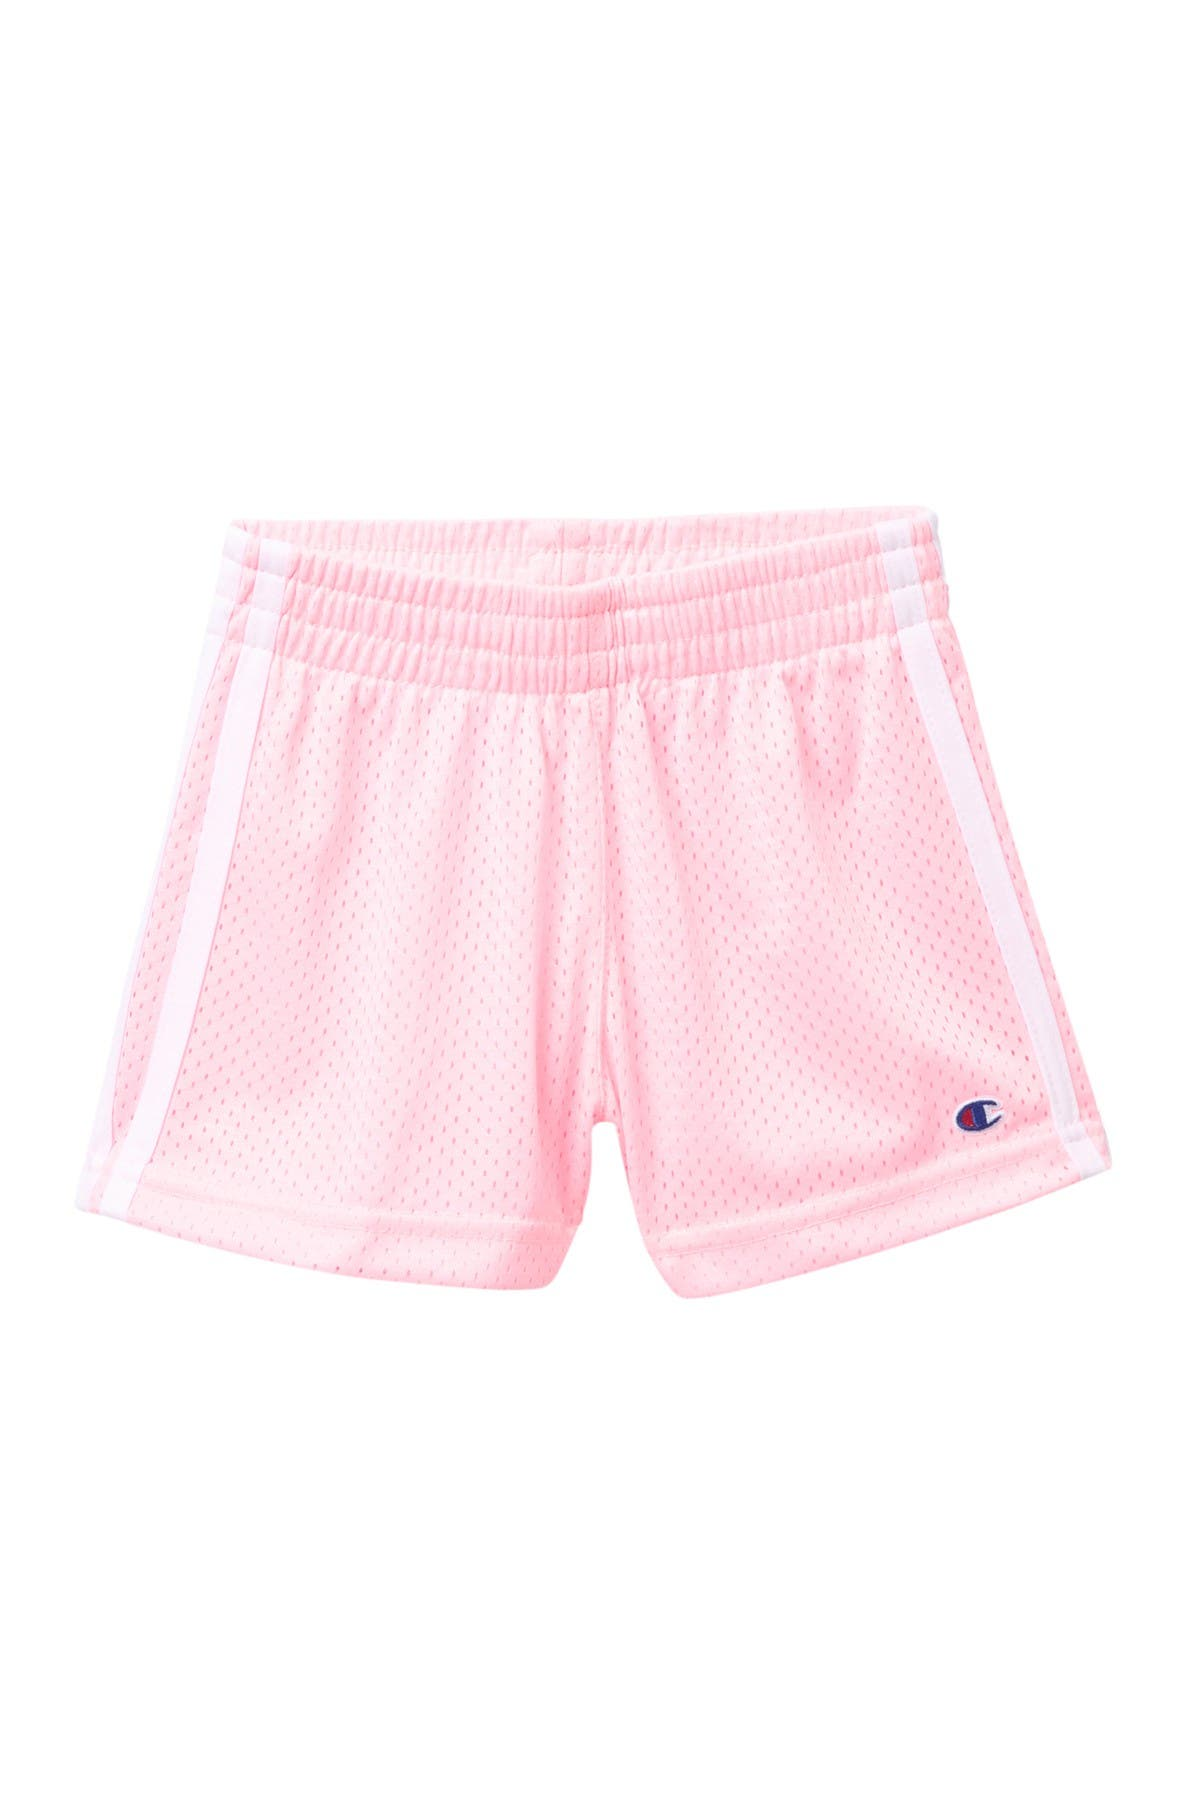 Image of Champion Mesh Shorts